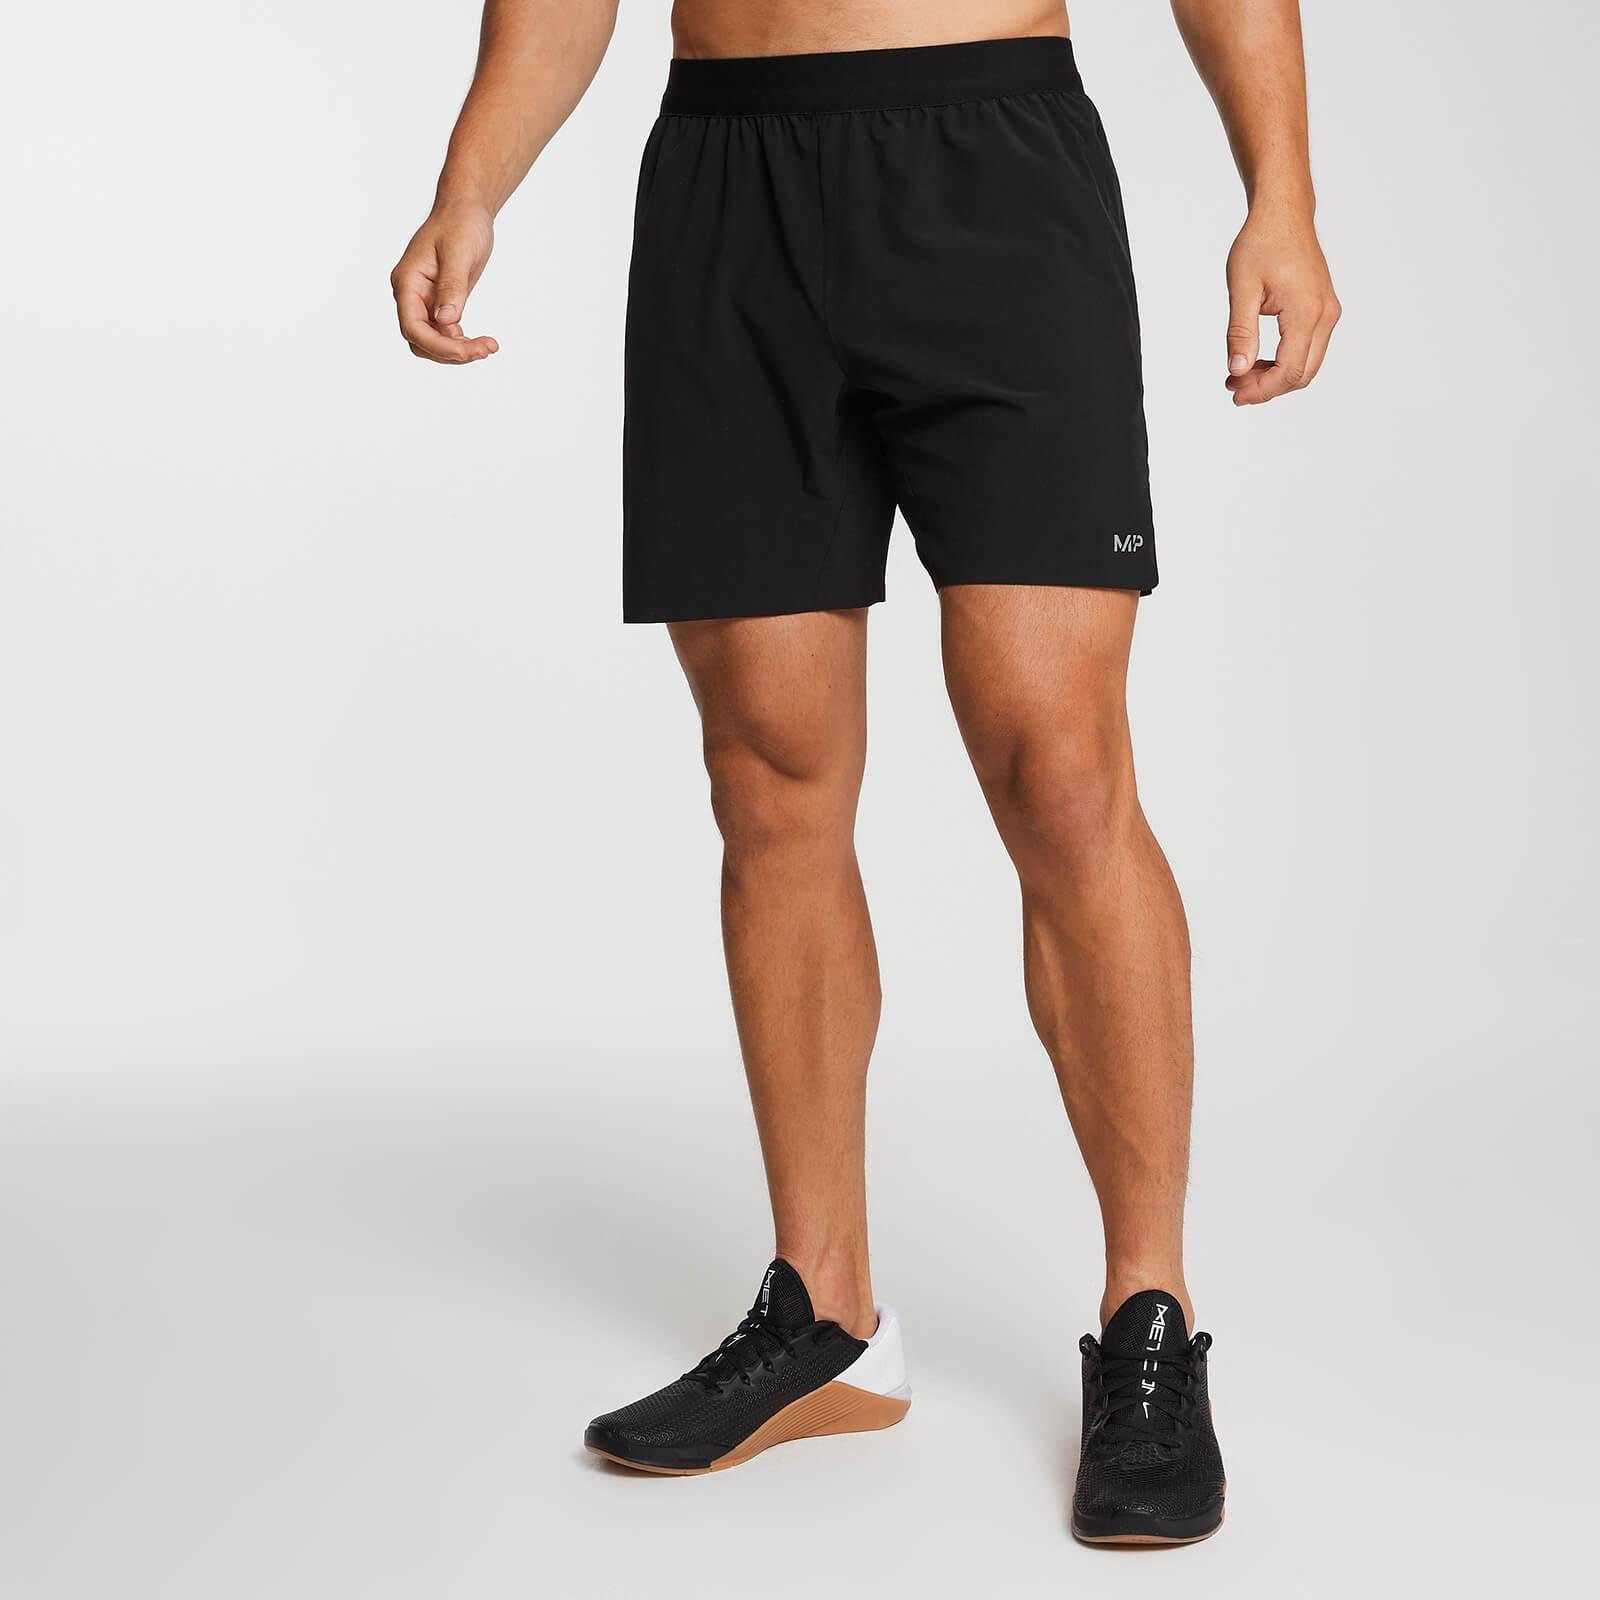 MP Essentials Training Shorts - Sort - Xxl